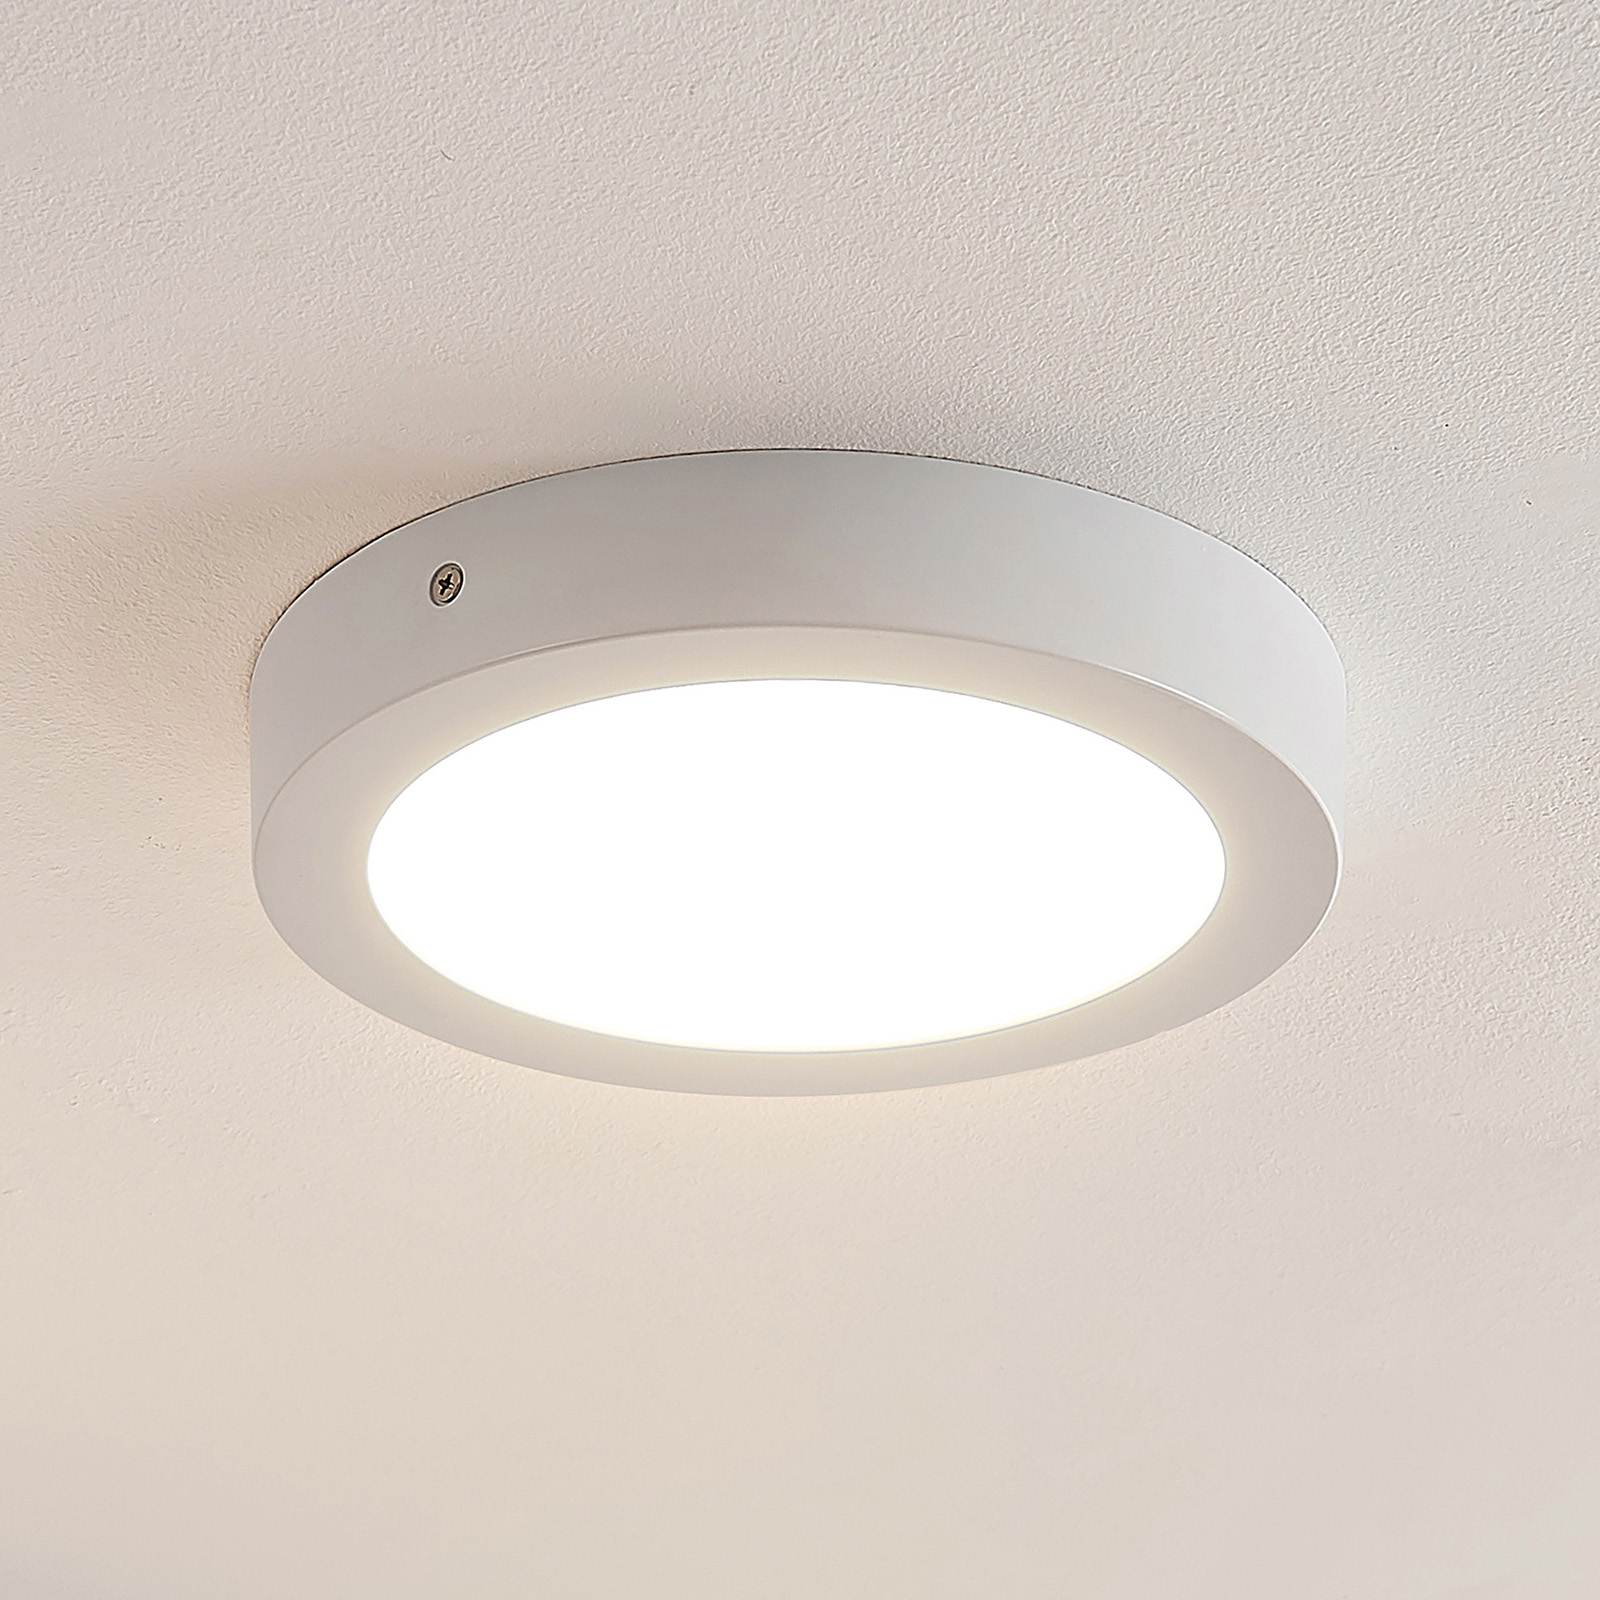 ELC Merina LED-kattovalaisin, valkoinen, 21,5 cm